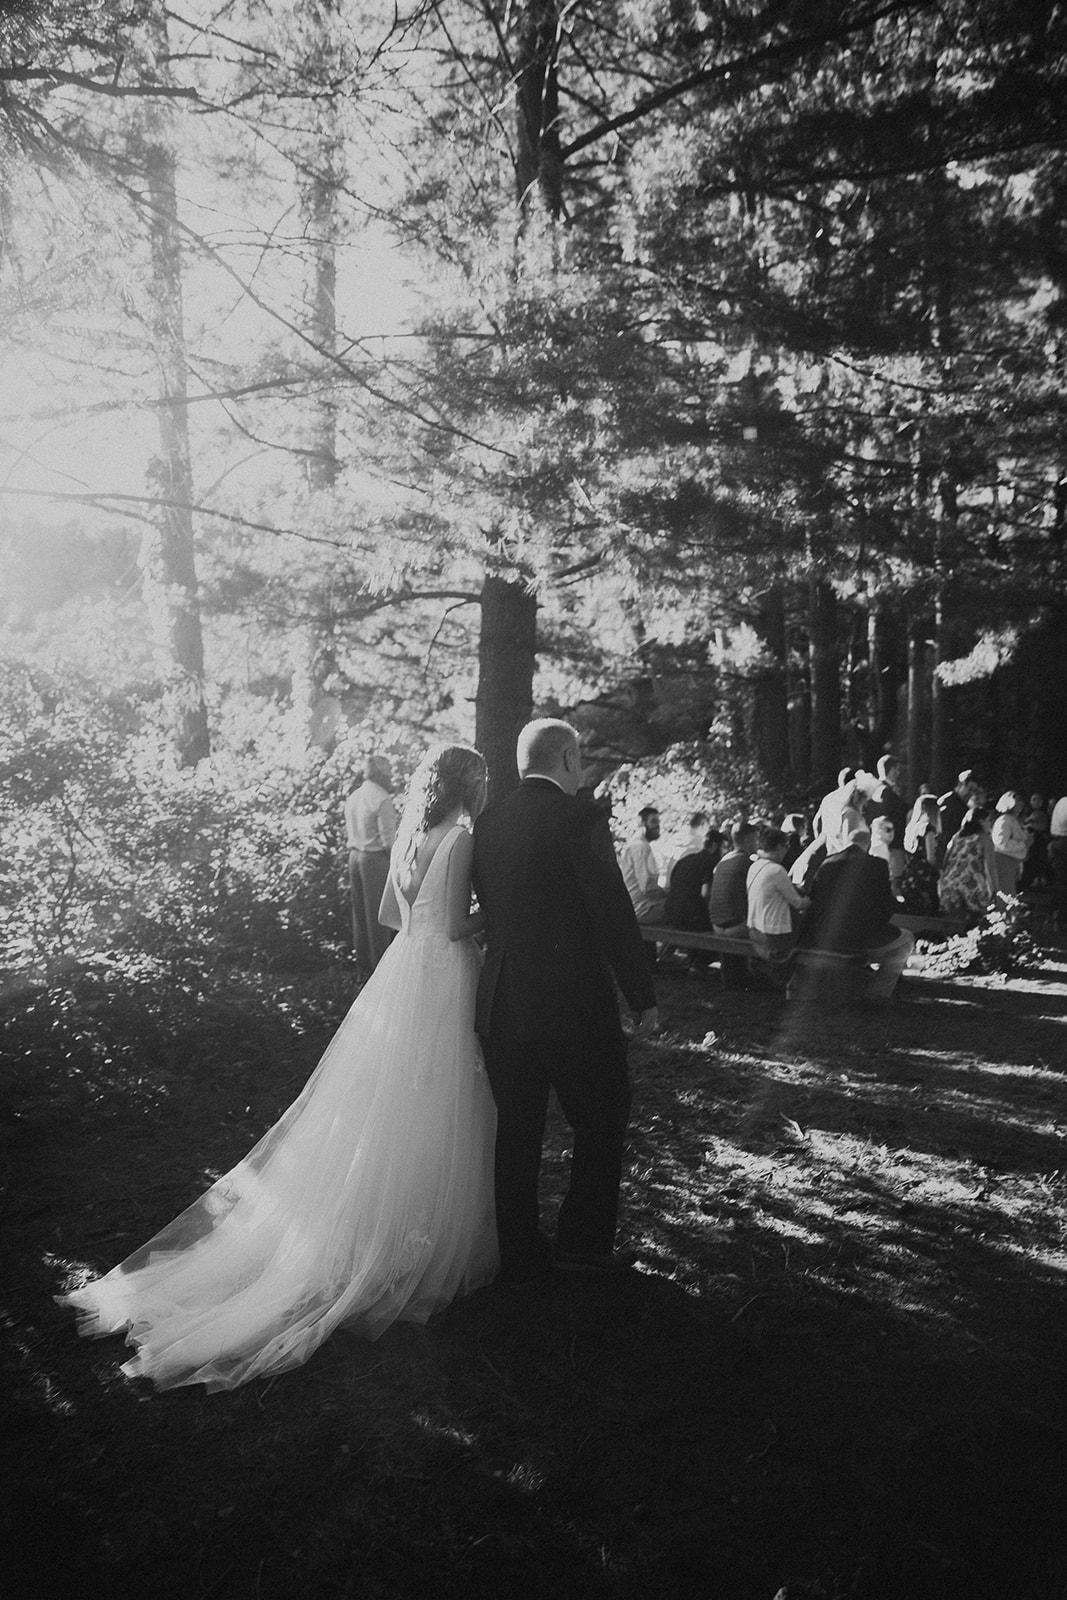 camp_wokanda_peoria_illinois_wedding_photographer_wright_photographs_bliese_0199.jpg